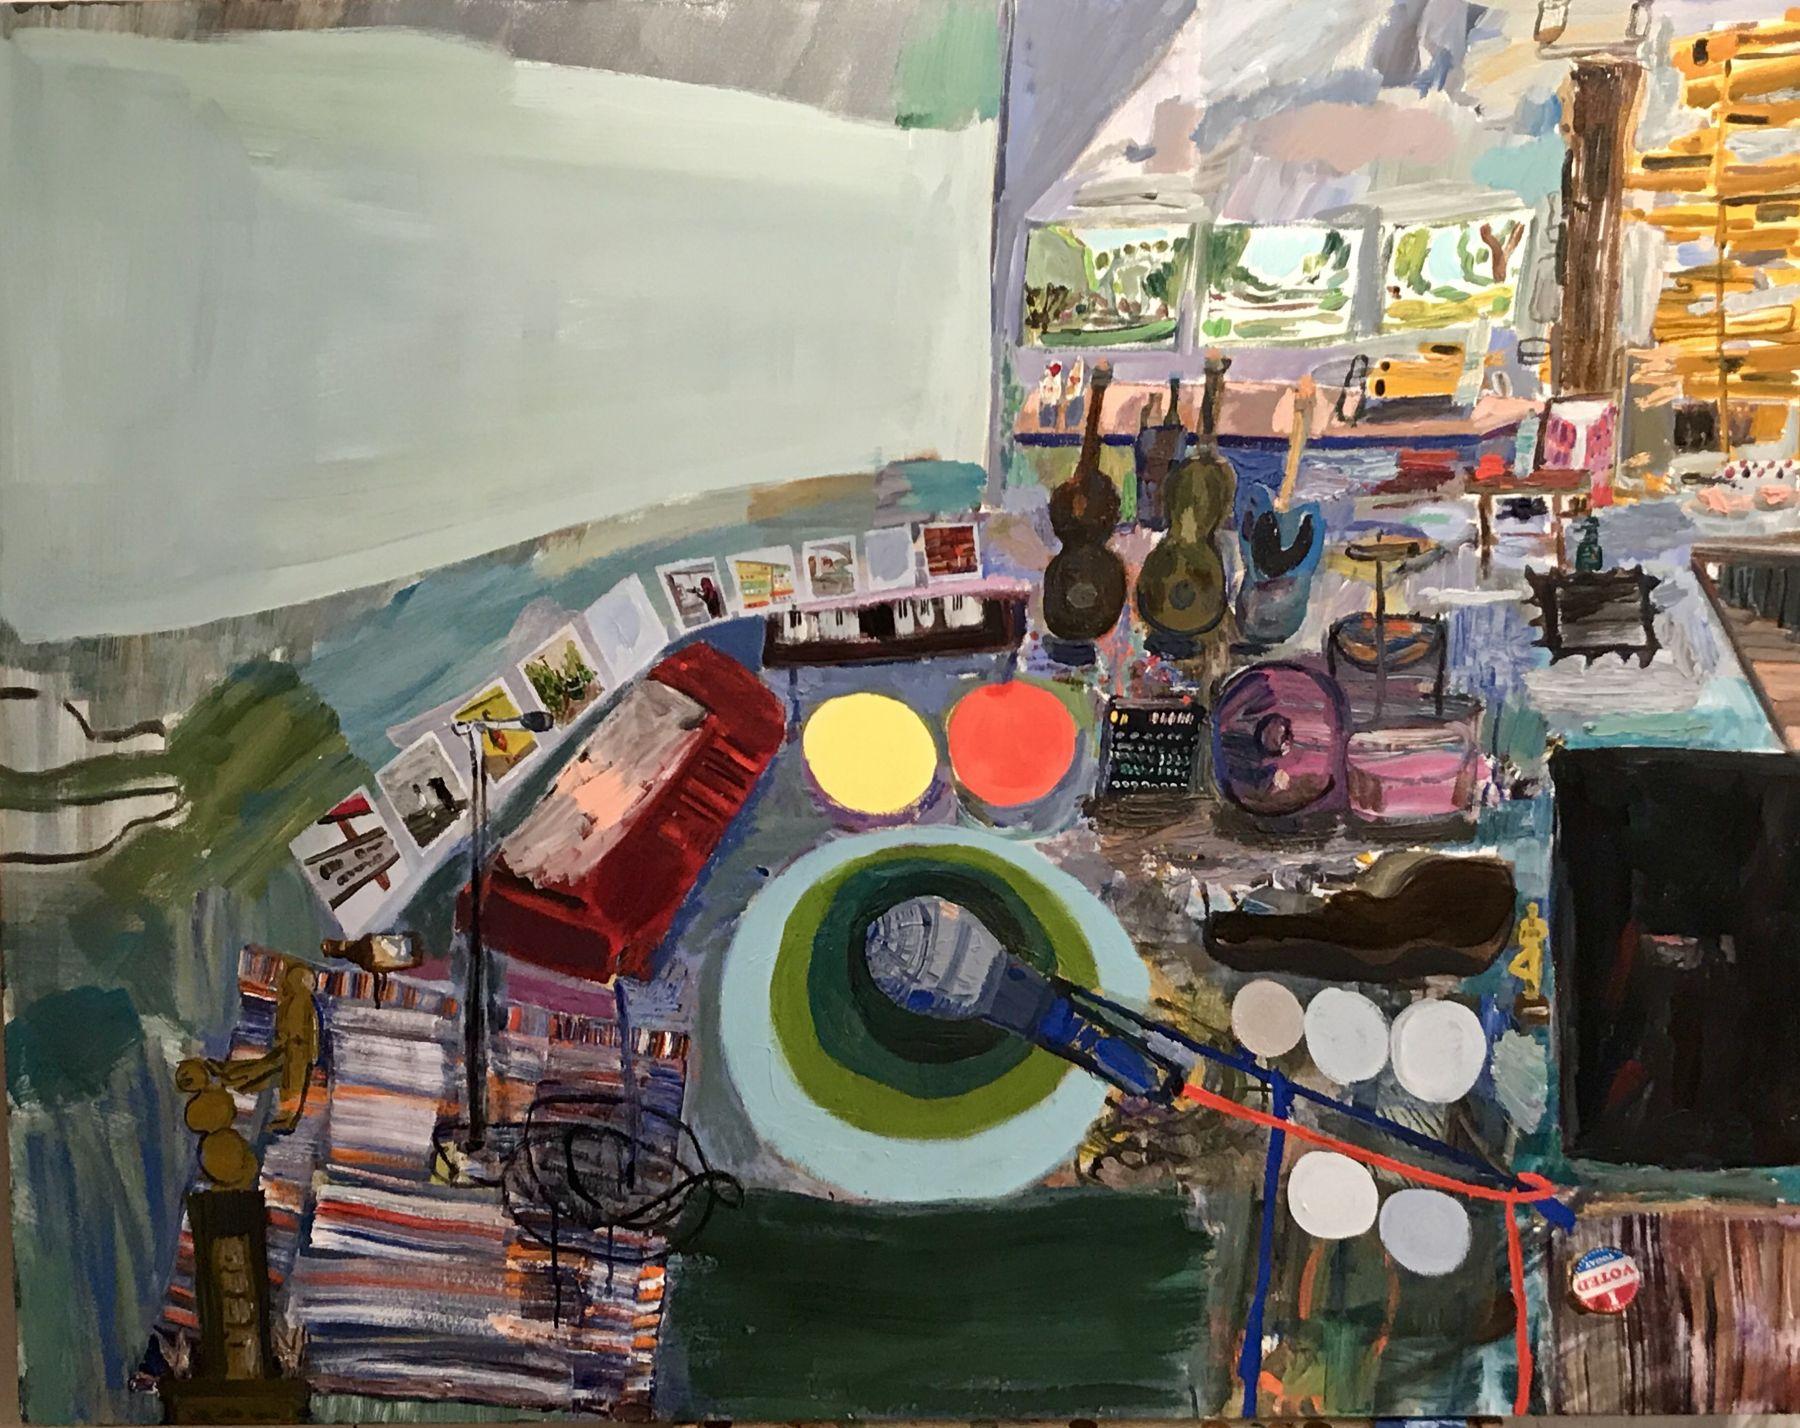 LISA SANDITZ, Tim's Studio, 2018